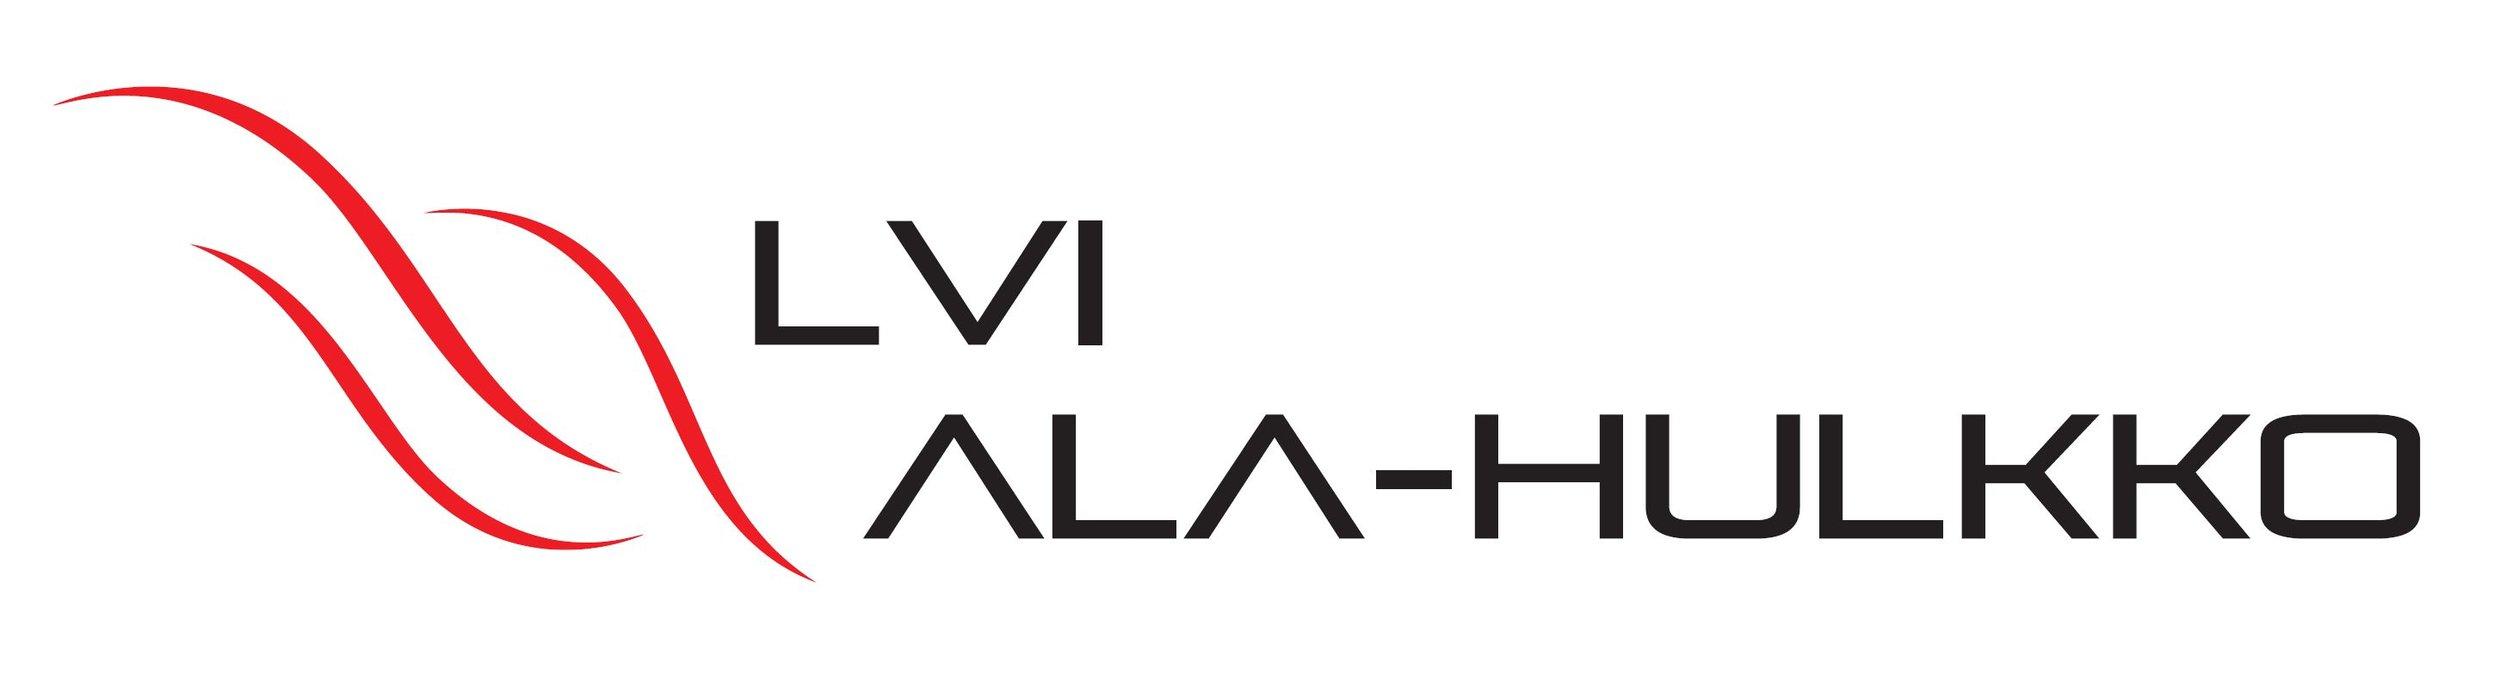 LVIAlaHulkko.JPG